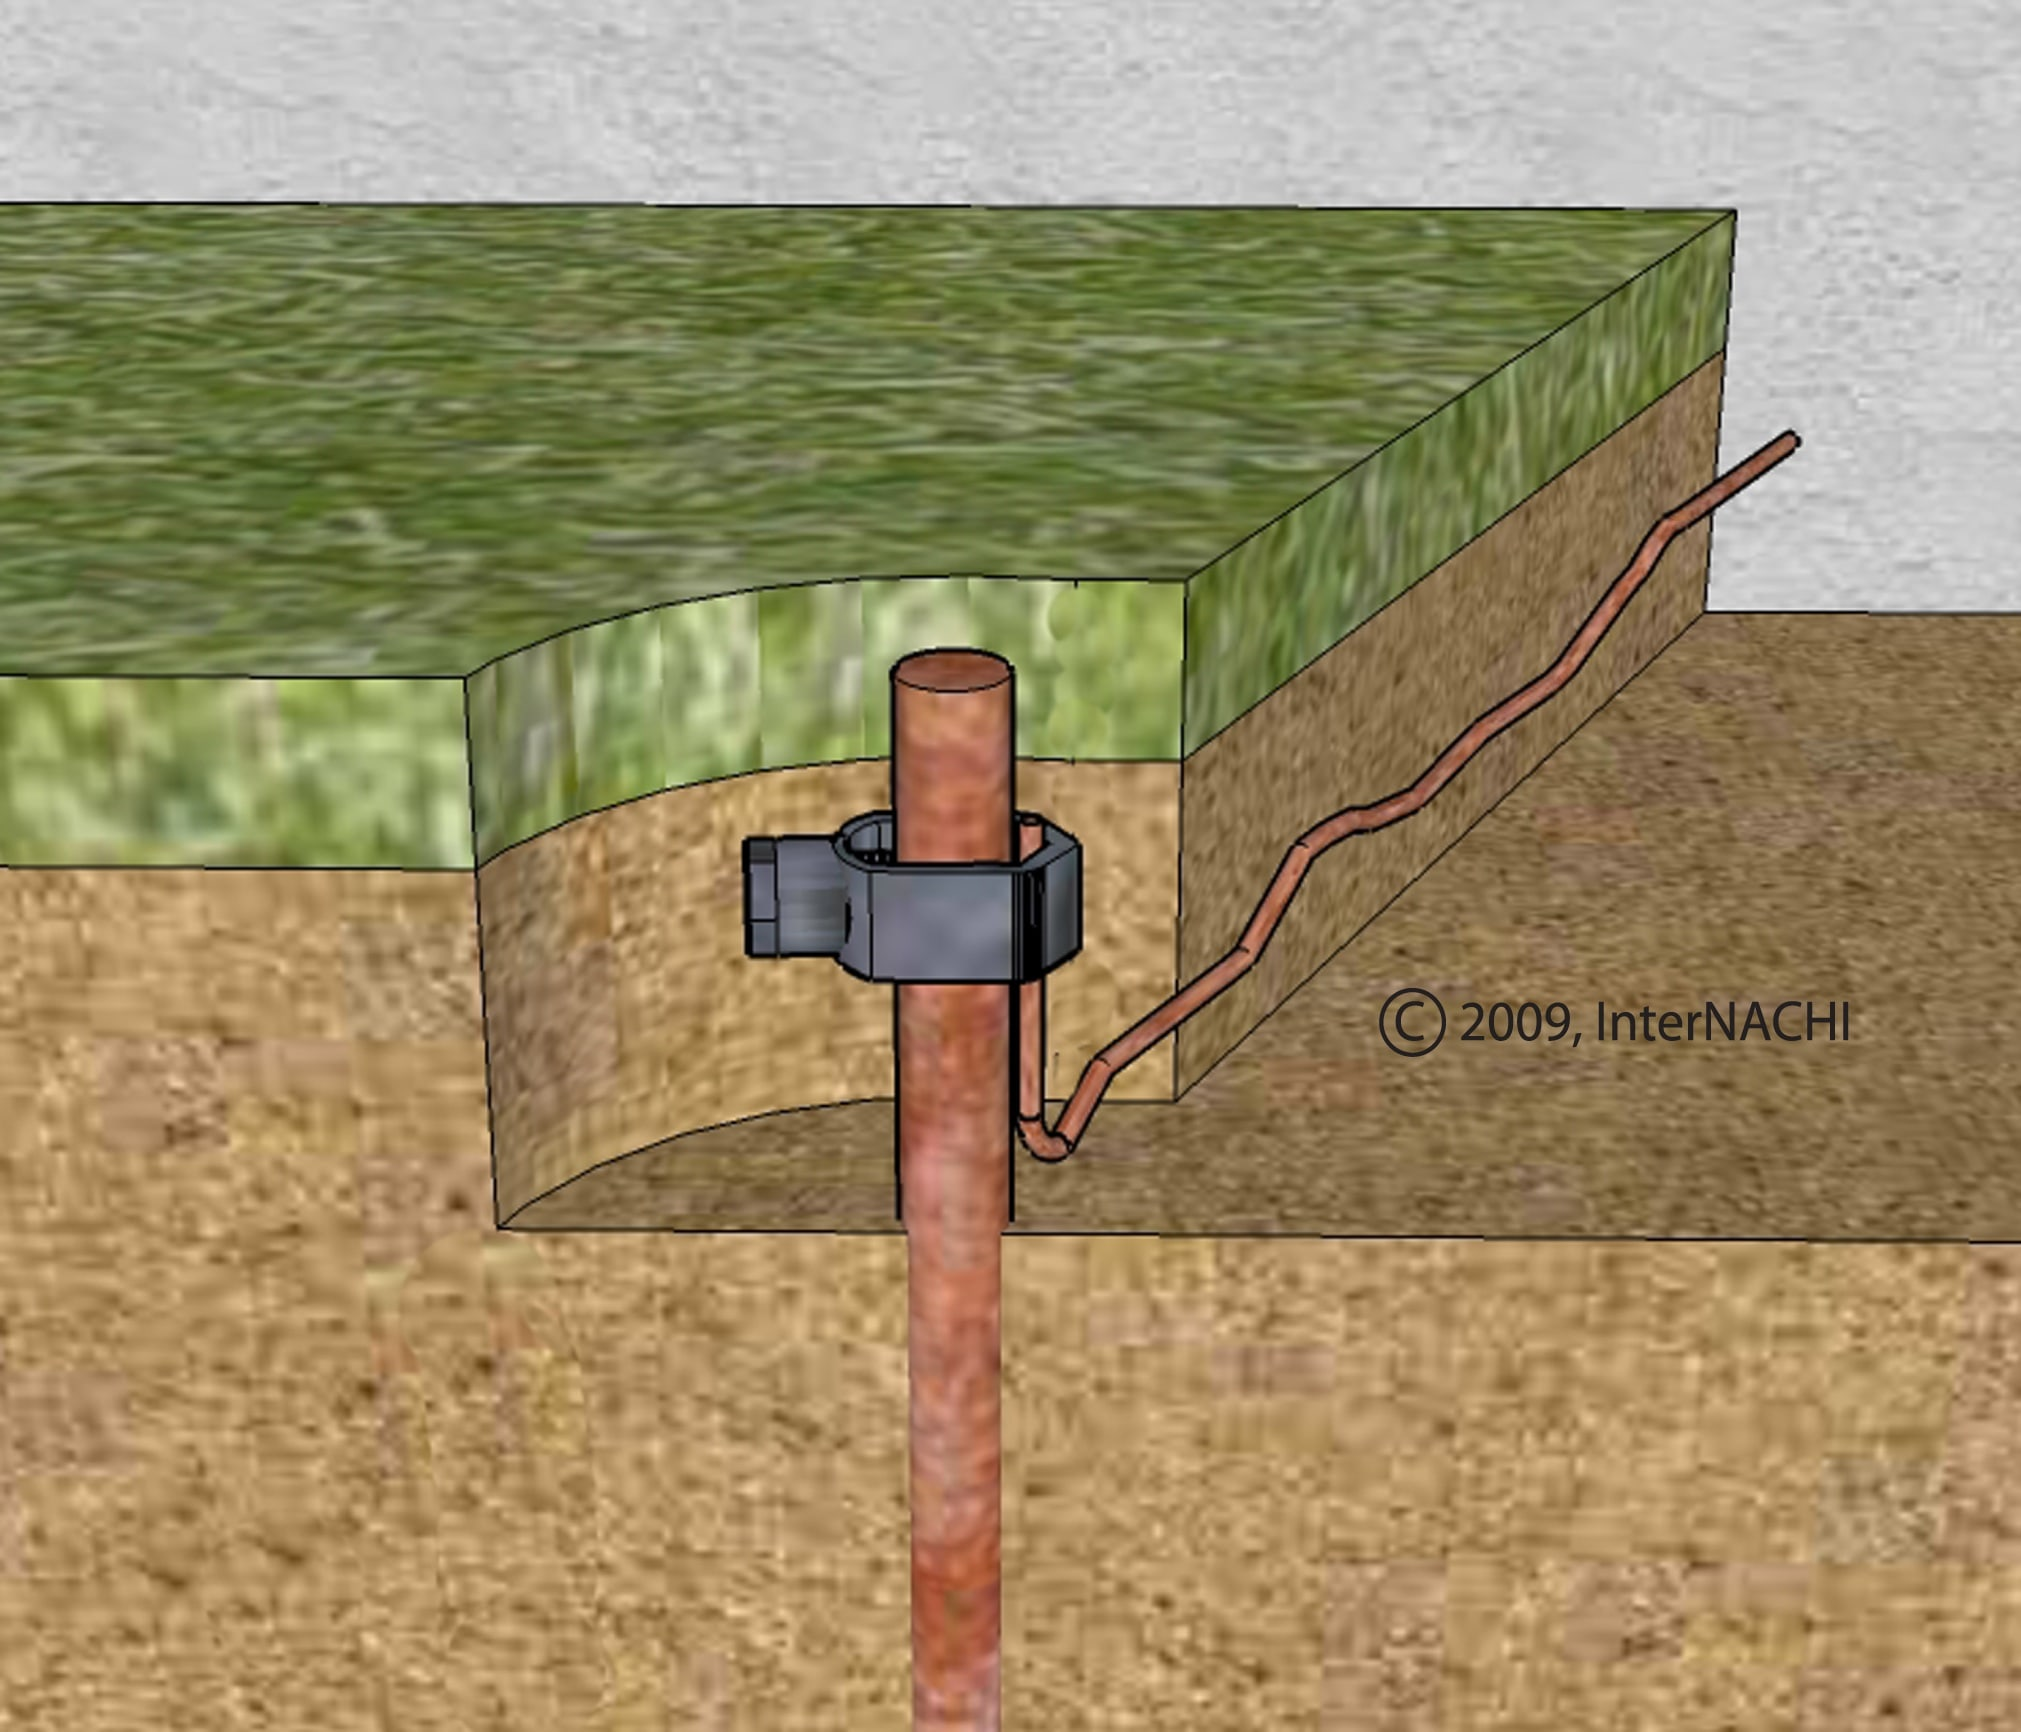 Grounding Rod - Inspection Gallery - InterNACHI